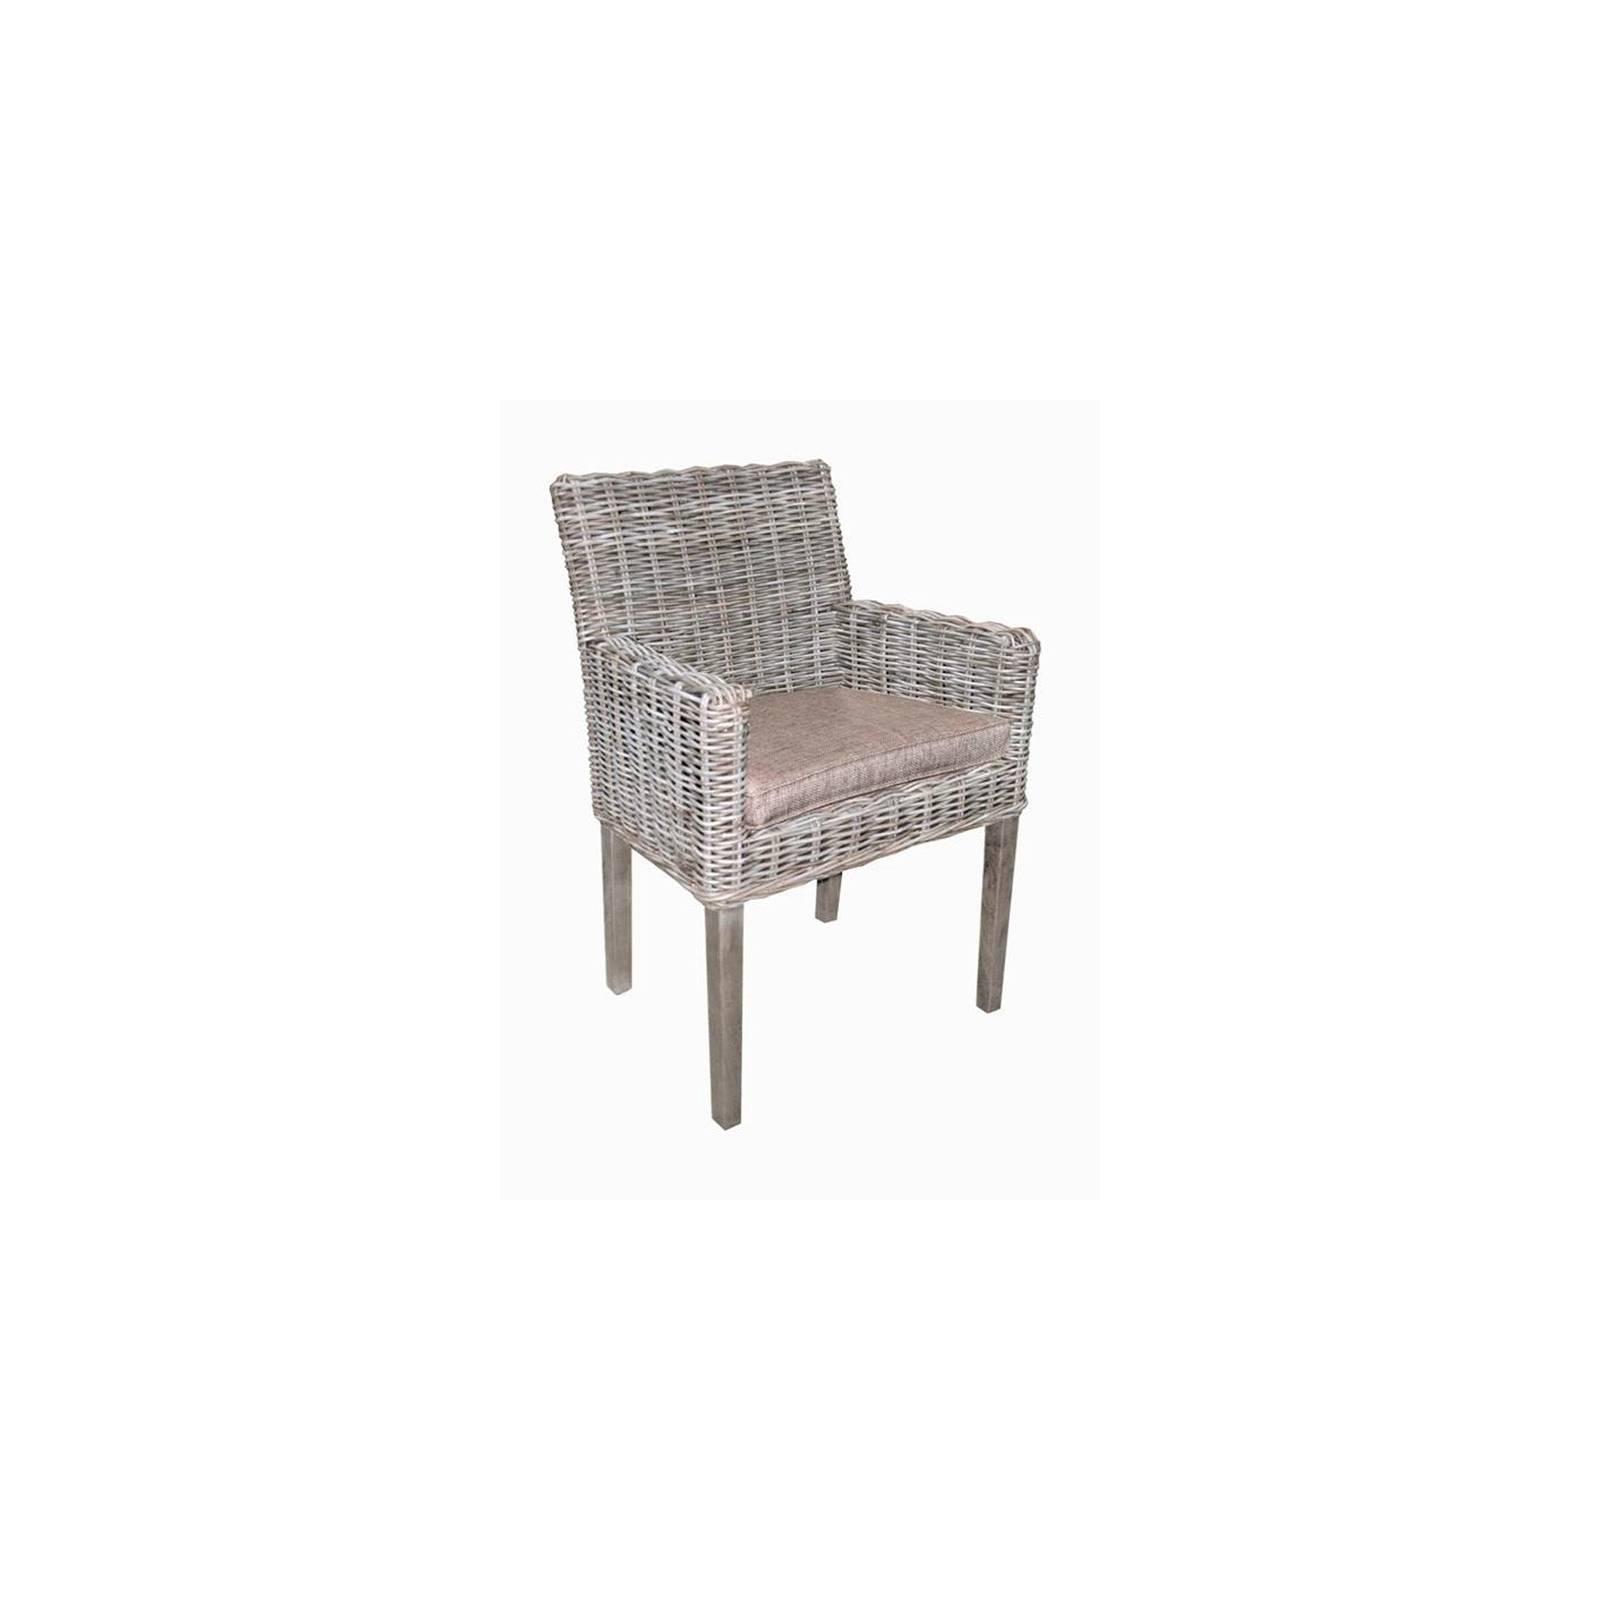 Fauteuil Sharon Kobo Rotin - meuble haut de gamme